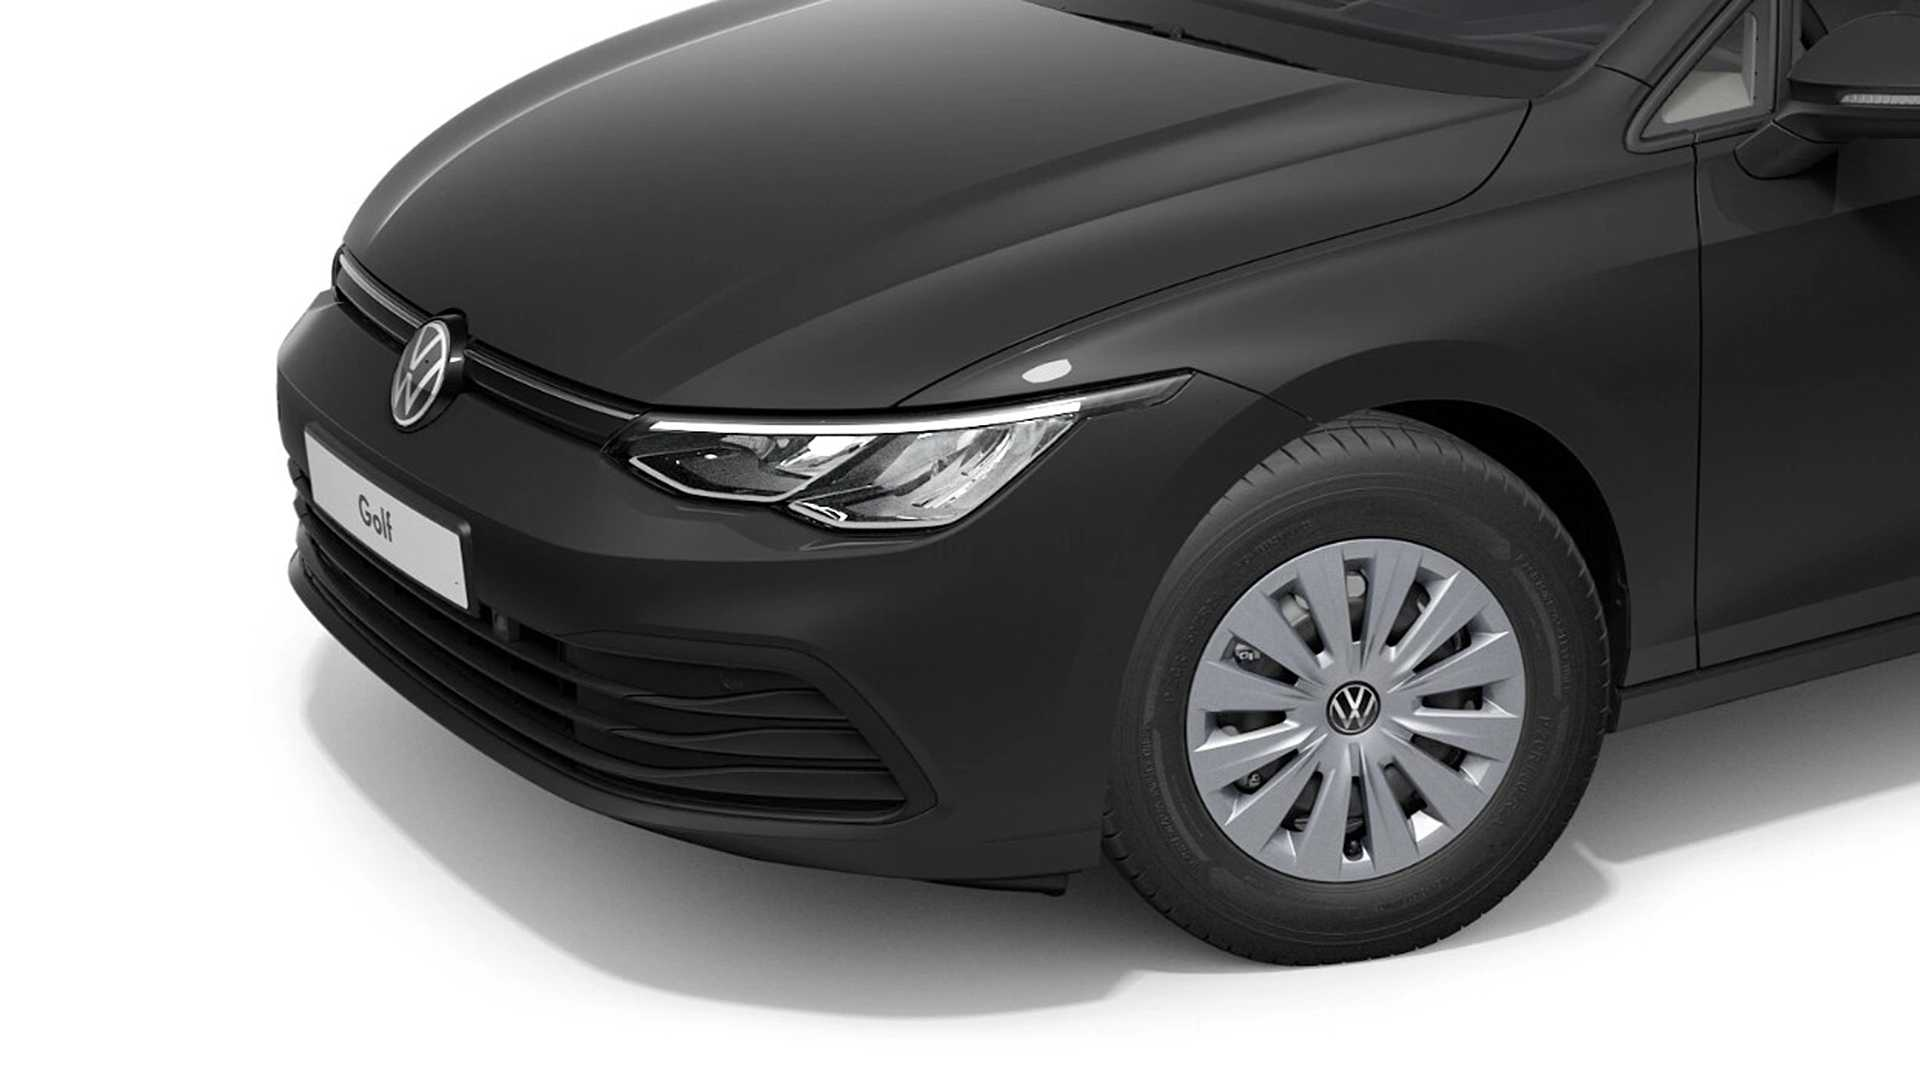 Volkswagen-Golf-2020-Base-Model-7